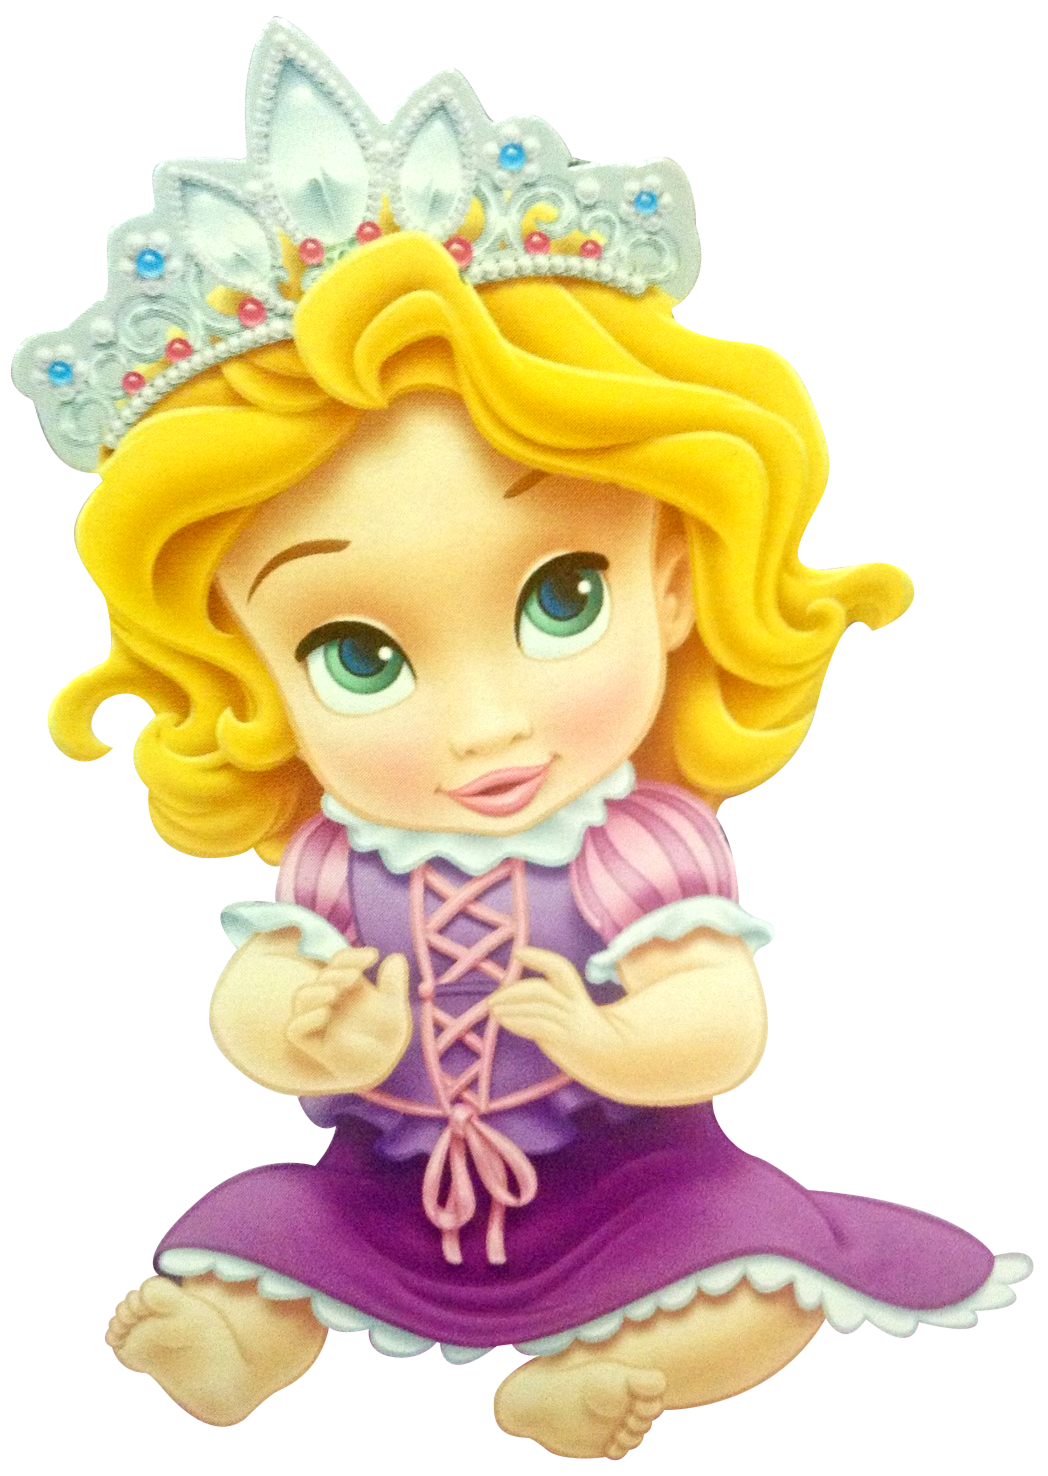 DISNEY PRINCESS BABIES 1st BIRTHDAY BIB ~ Party Supplies ...  |Baby Disney Princess